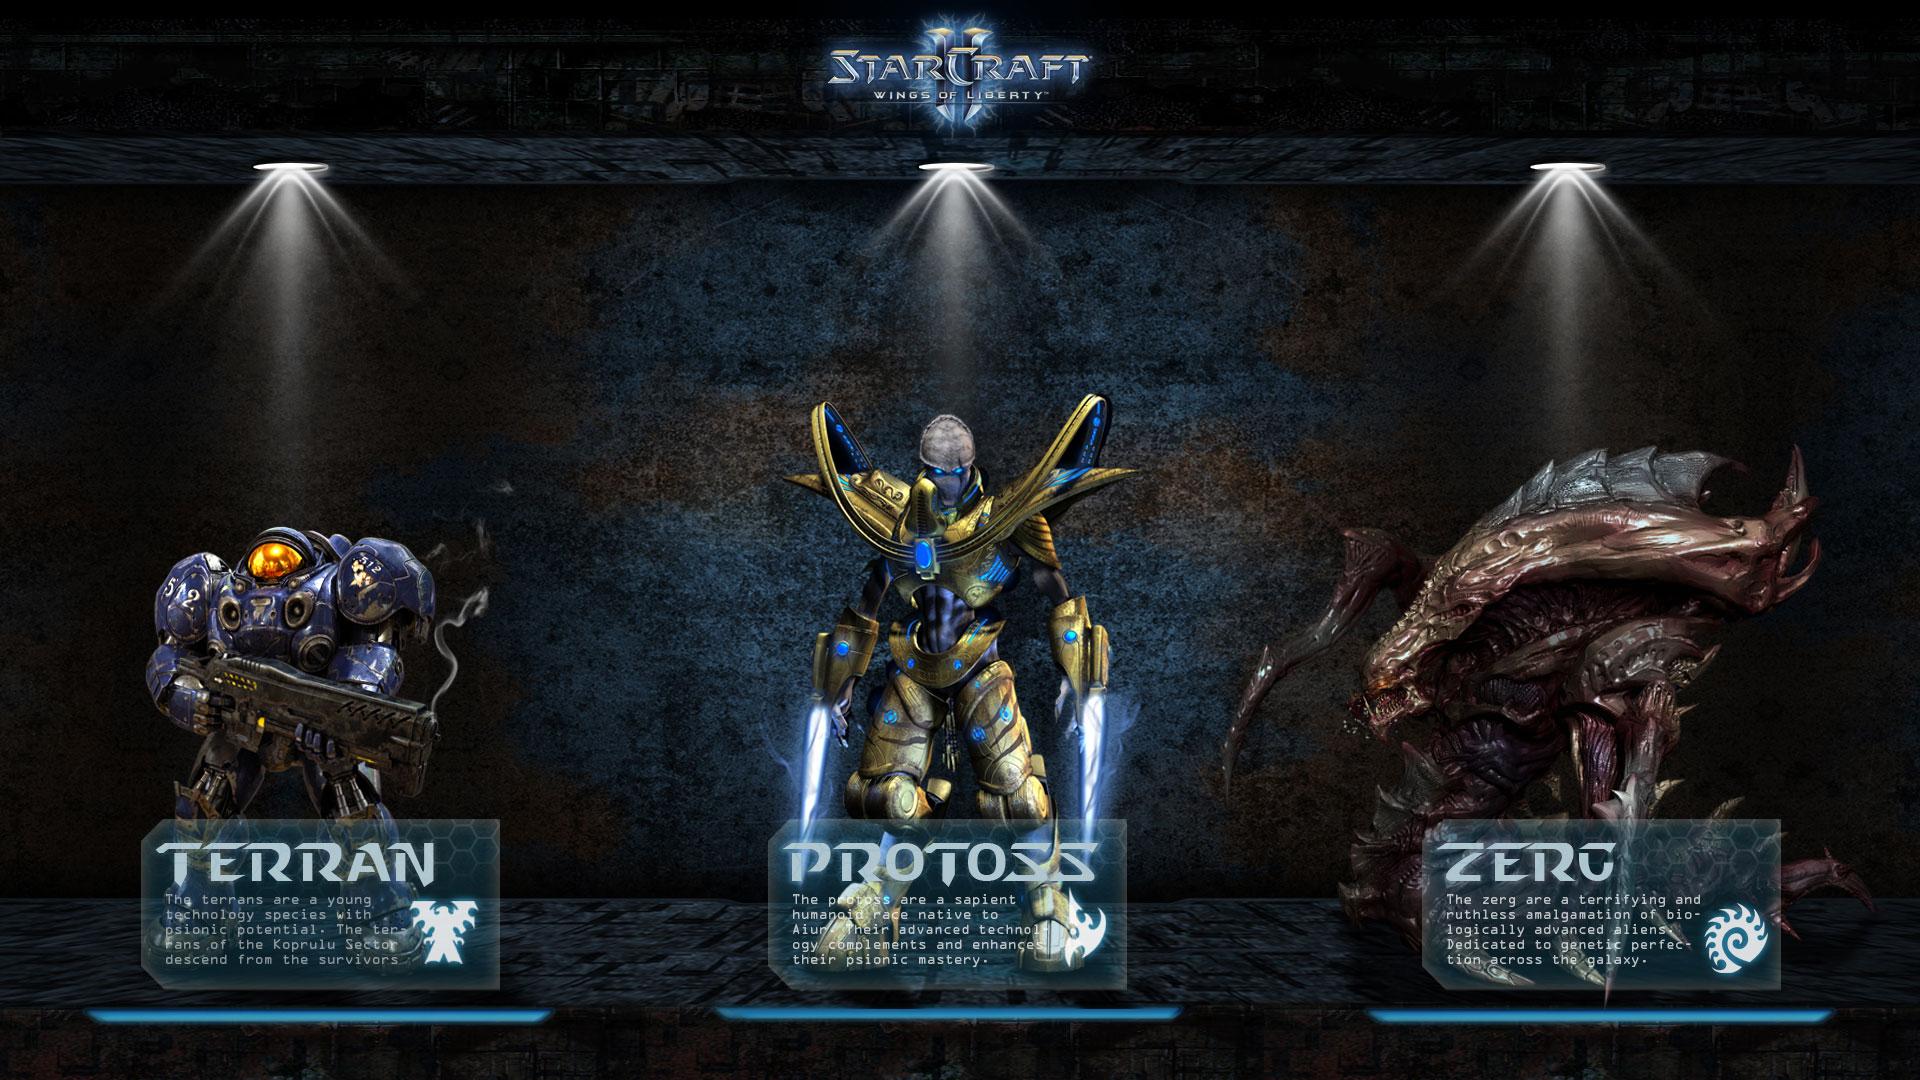 Games Wallpapers   Starcraft 2 Races 1920x1080 wallpaper 1920x1080